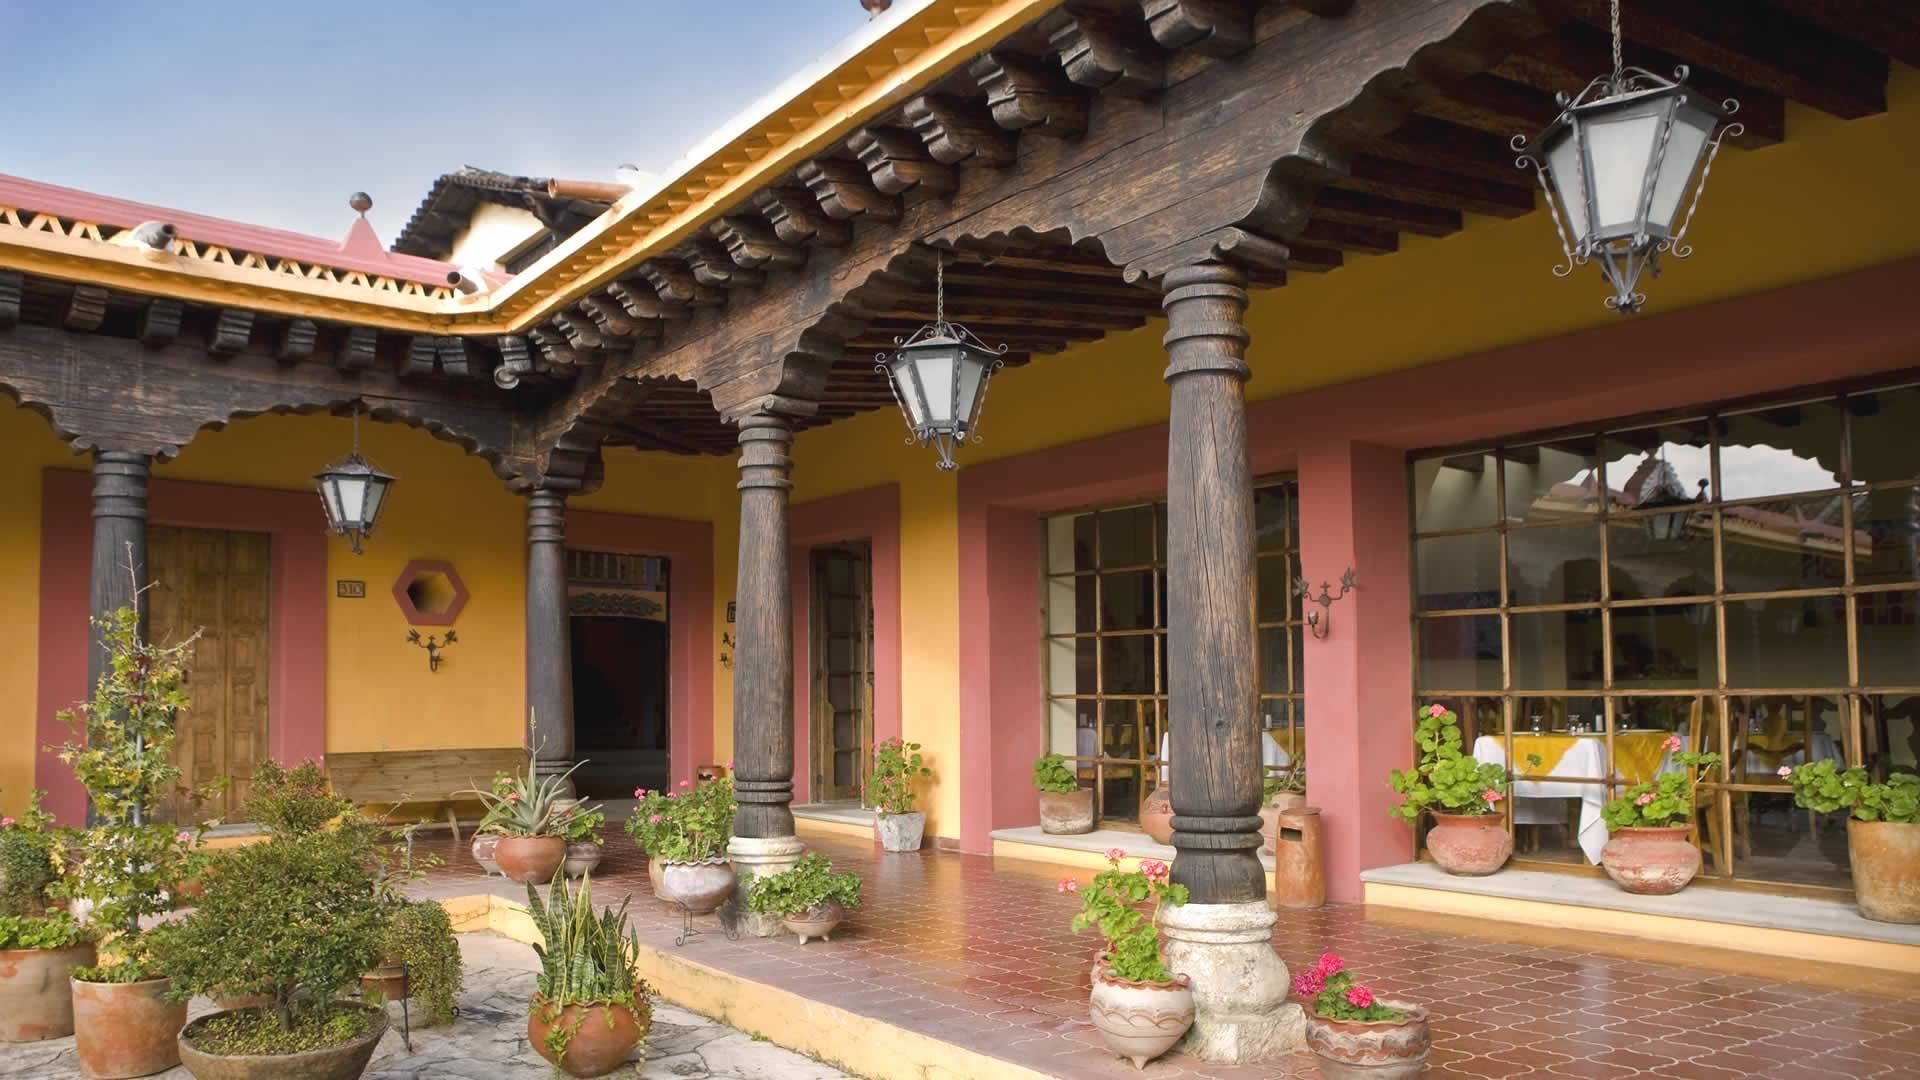 Hotel catedral san cristobal de las casas chiapas mx - Entradas de casas de campo ...